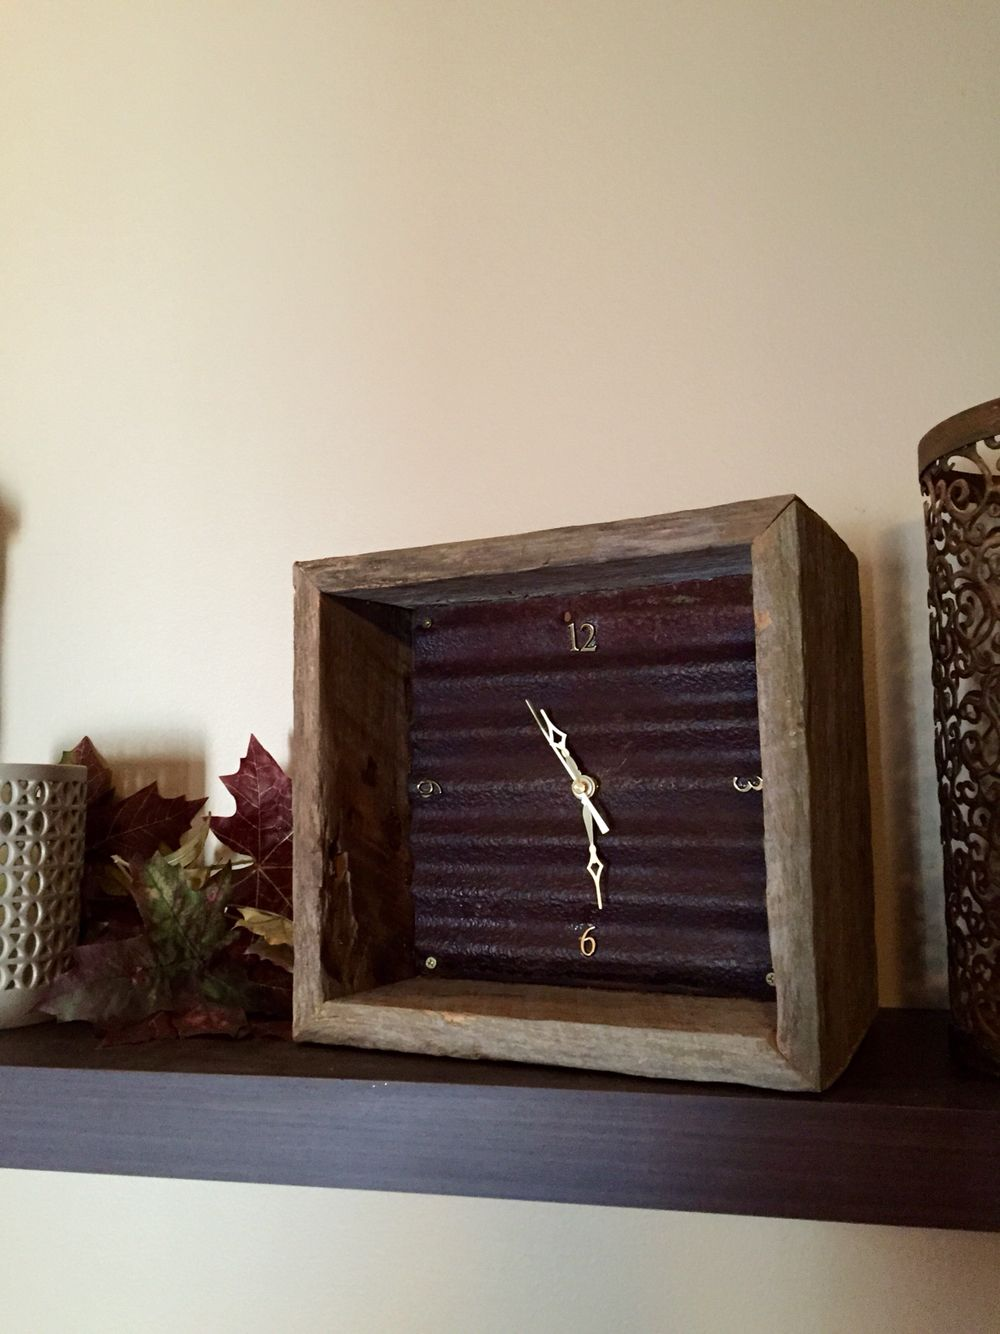 Rusty tin clock